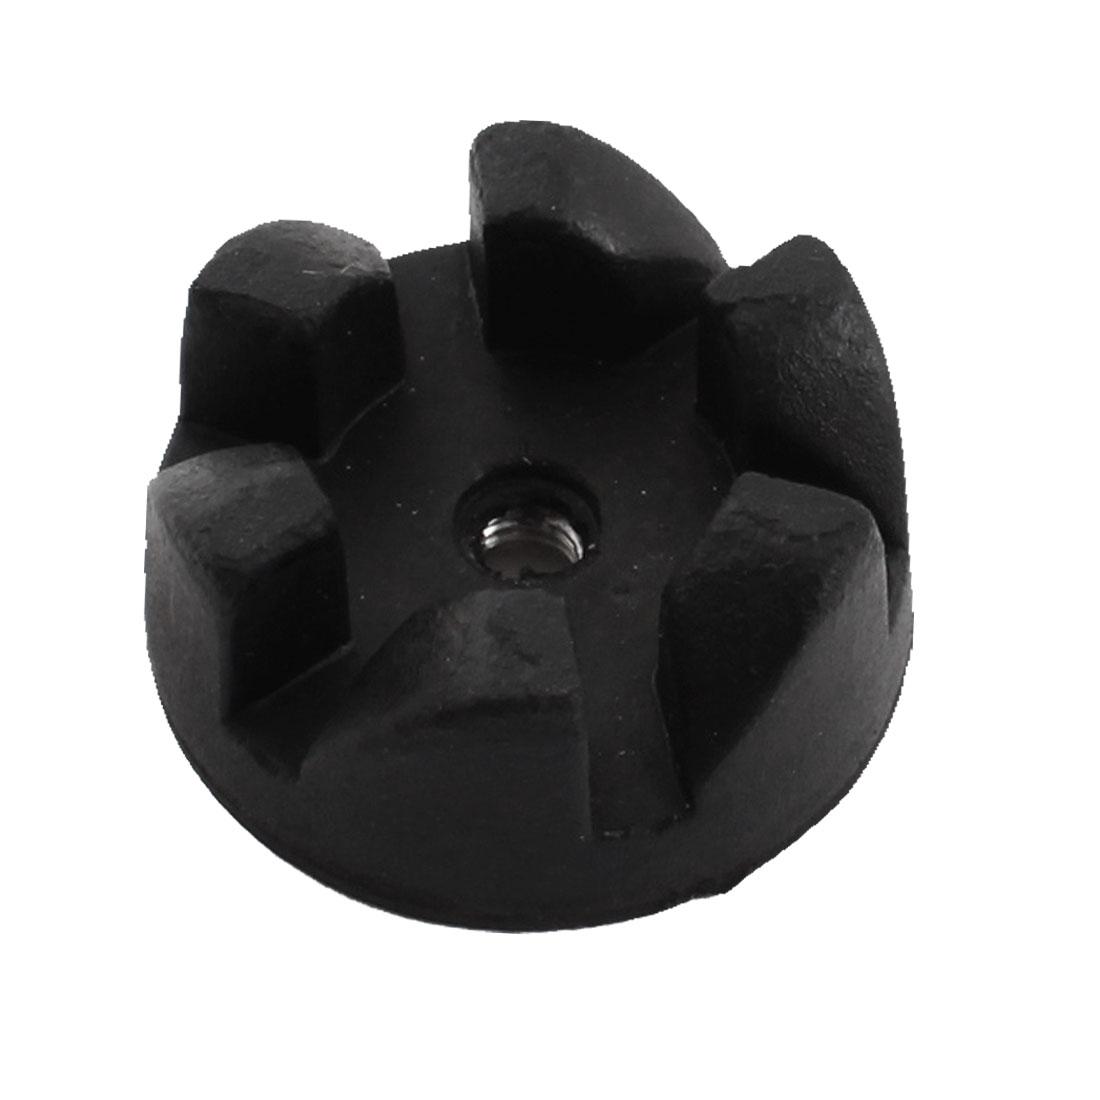 Kitchen Blender 6-Teeth Black Rubber Coupling Coupler Drive Clutch 4mm Thread